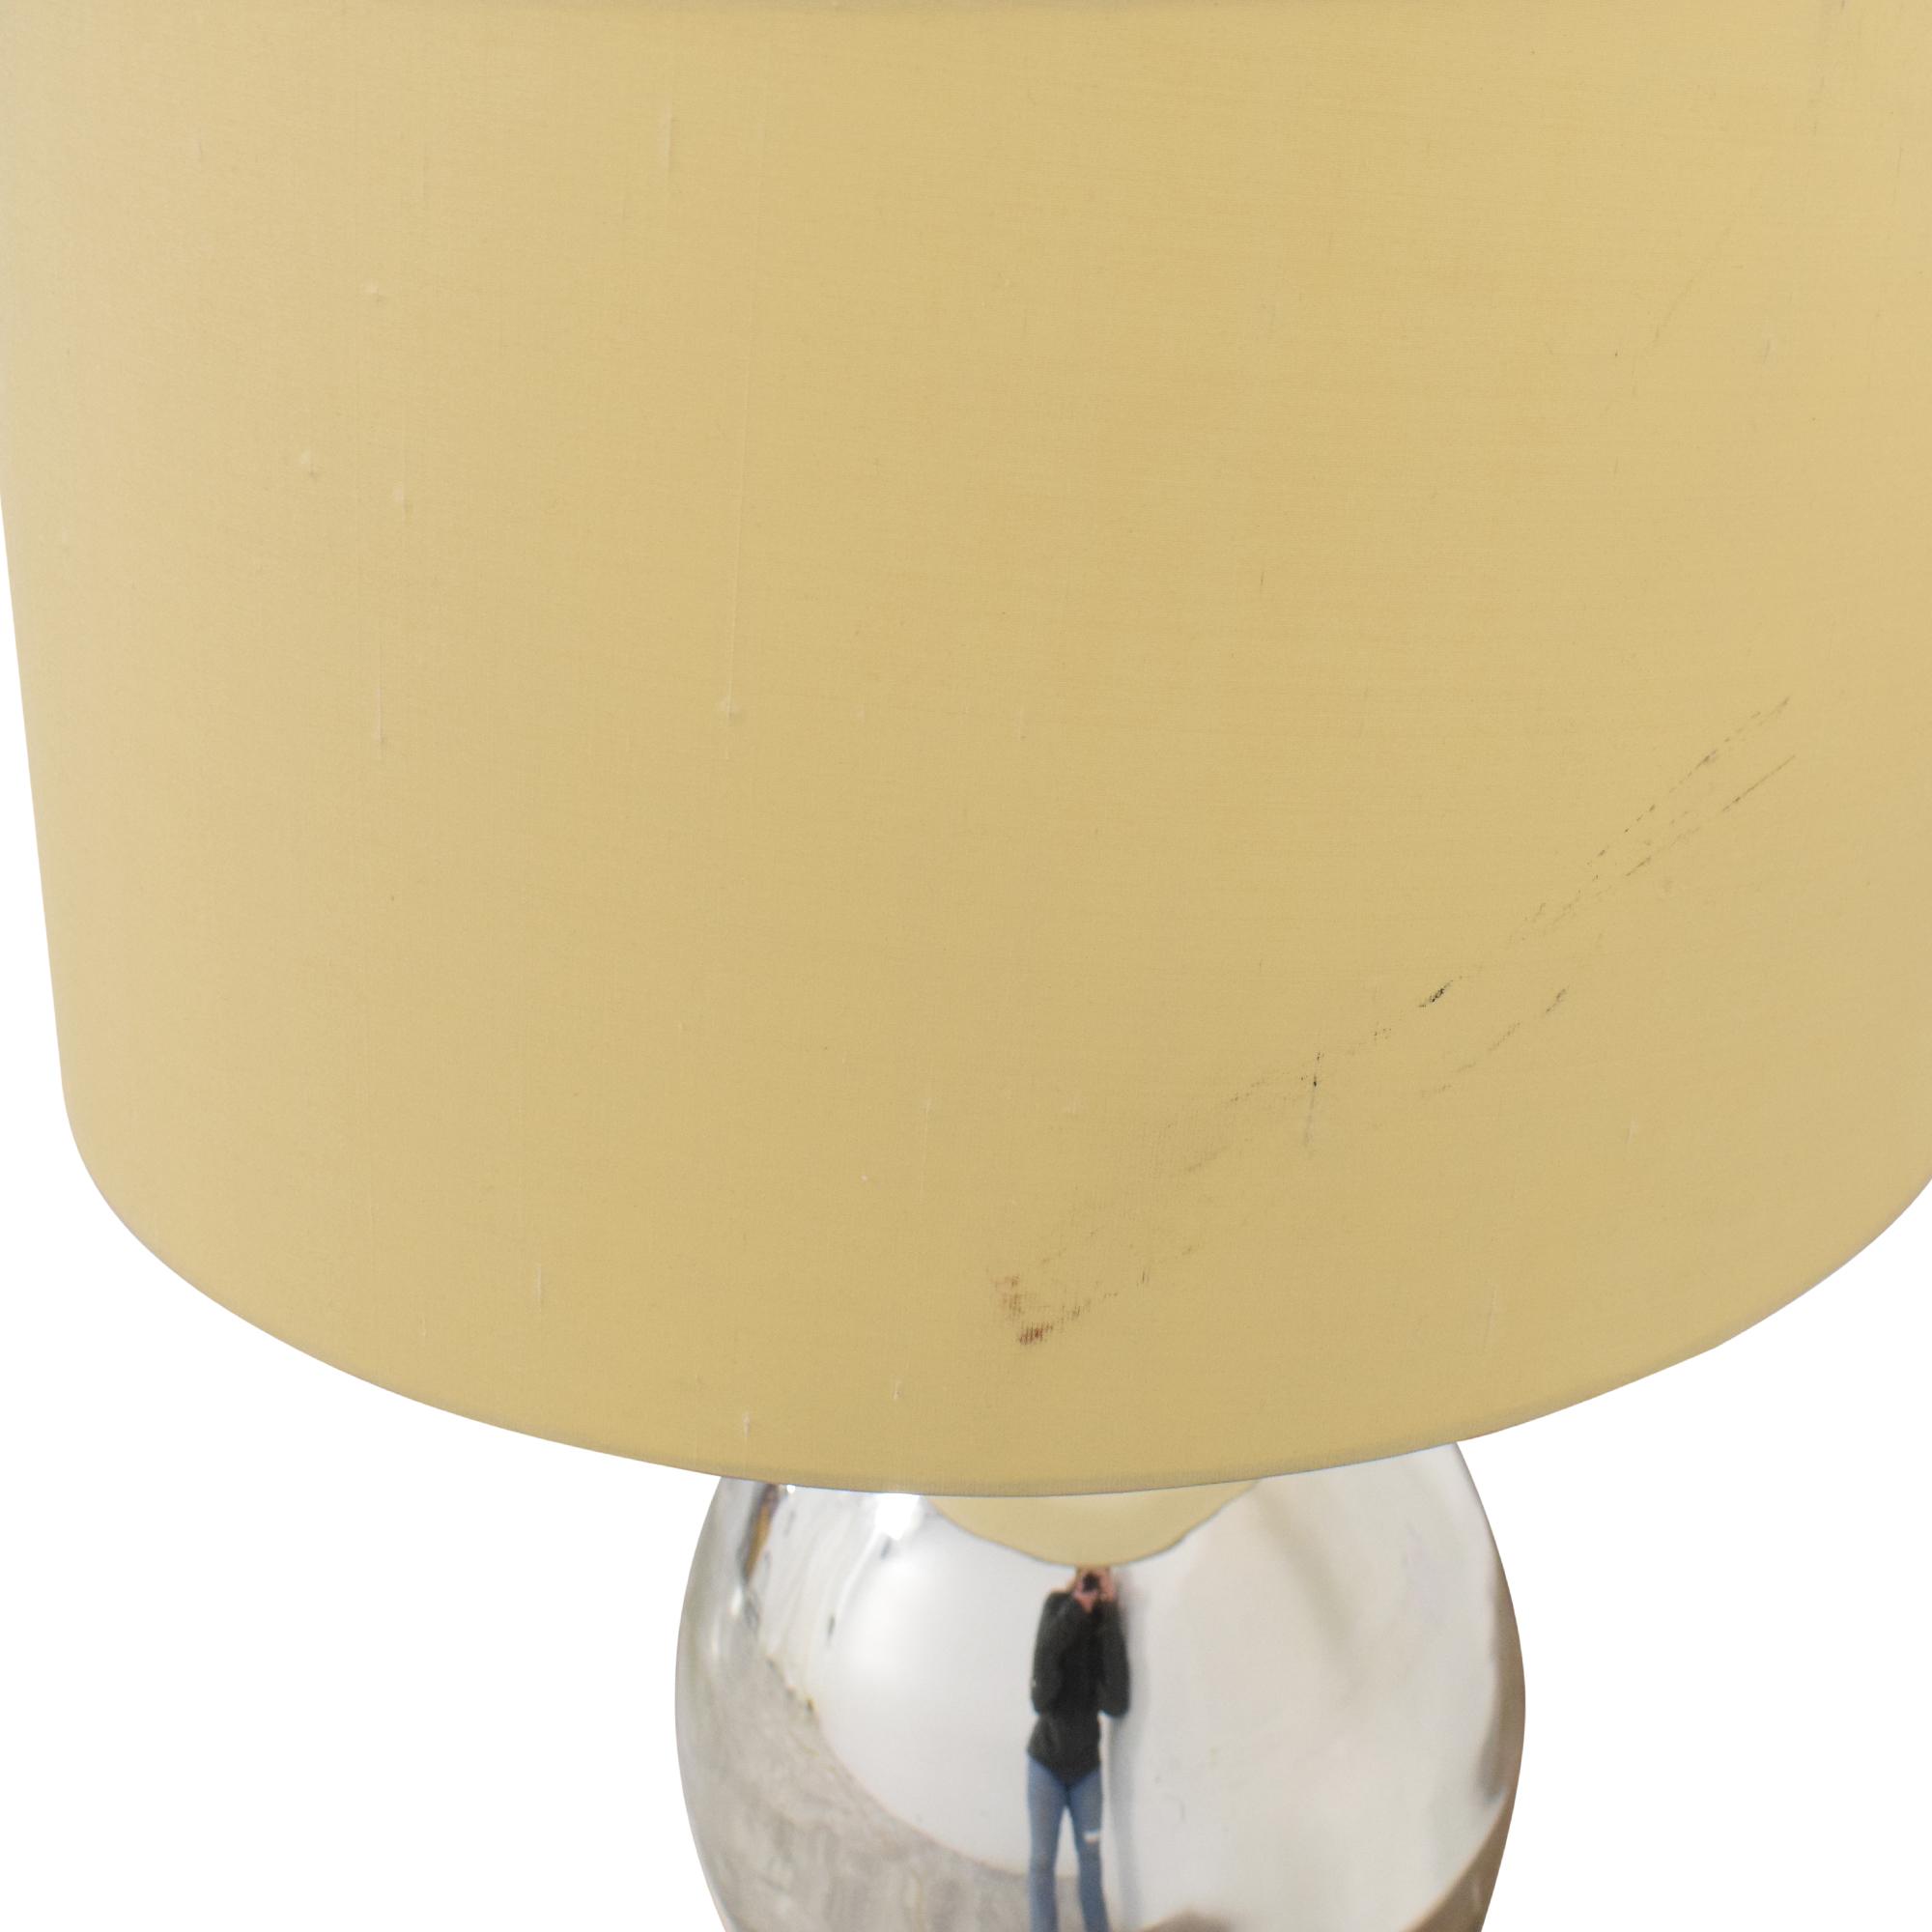 ABC Carpet & Home Decorative Table Lamp pa